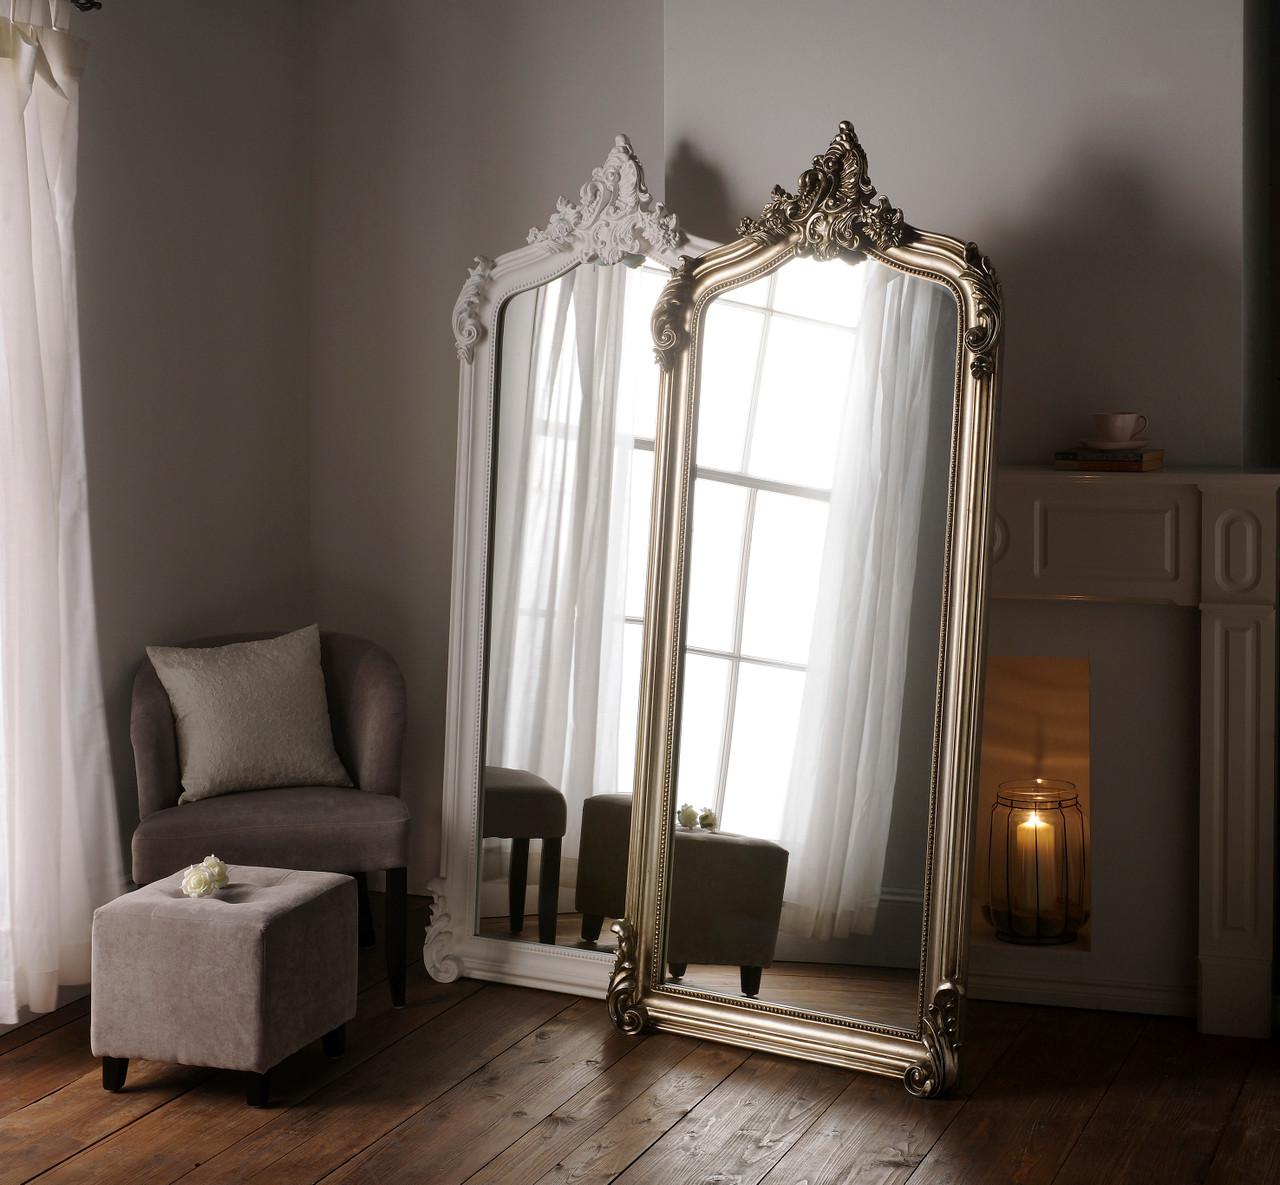 Monroe Extra Large Decorative Mirror 183x76cm